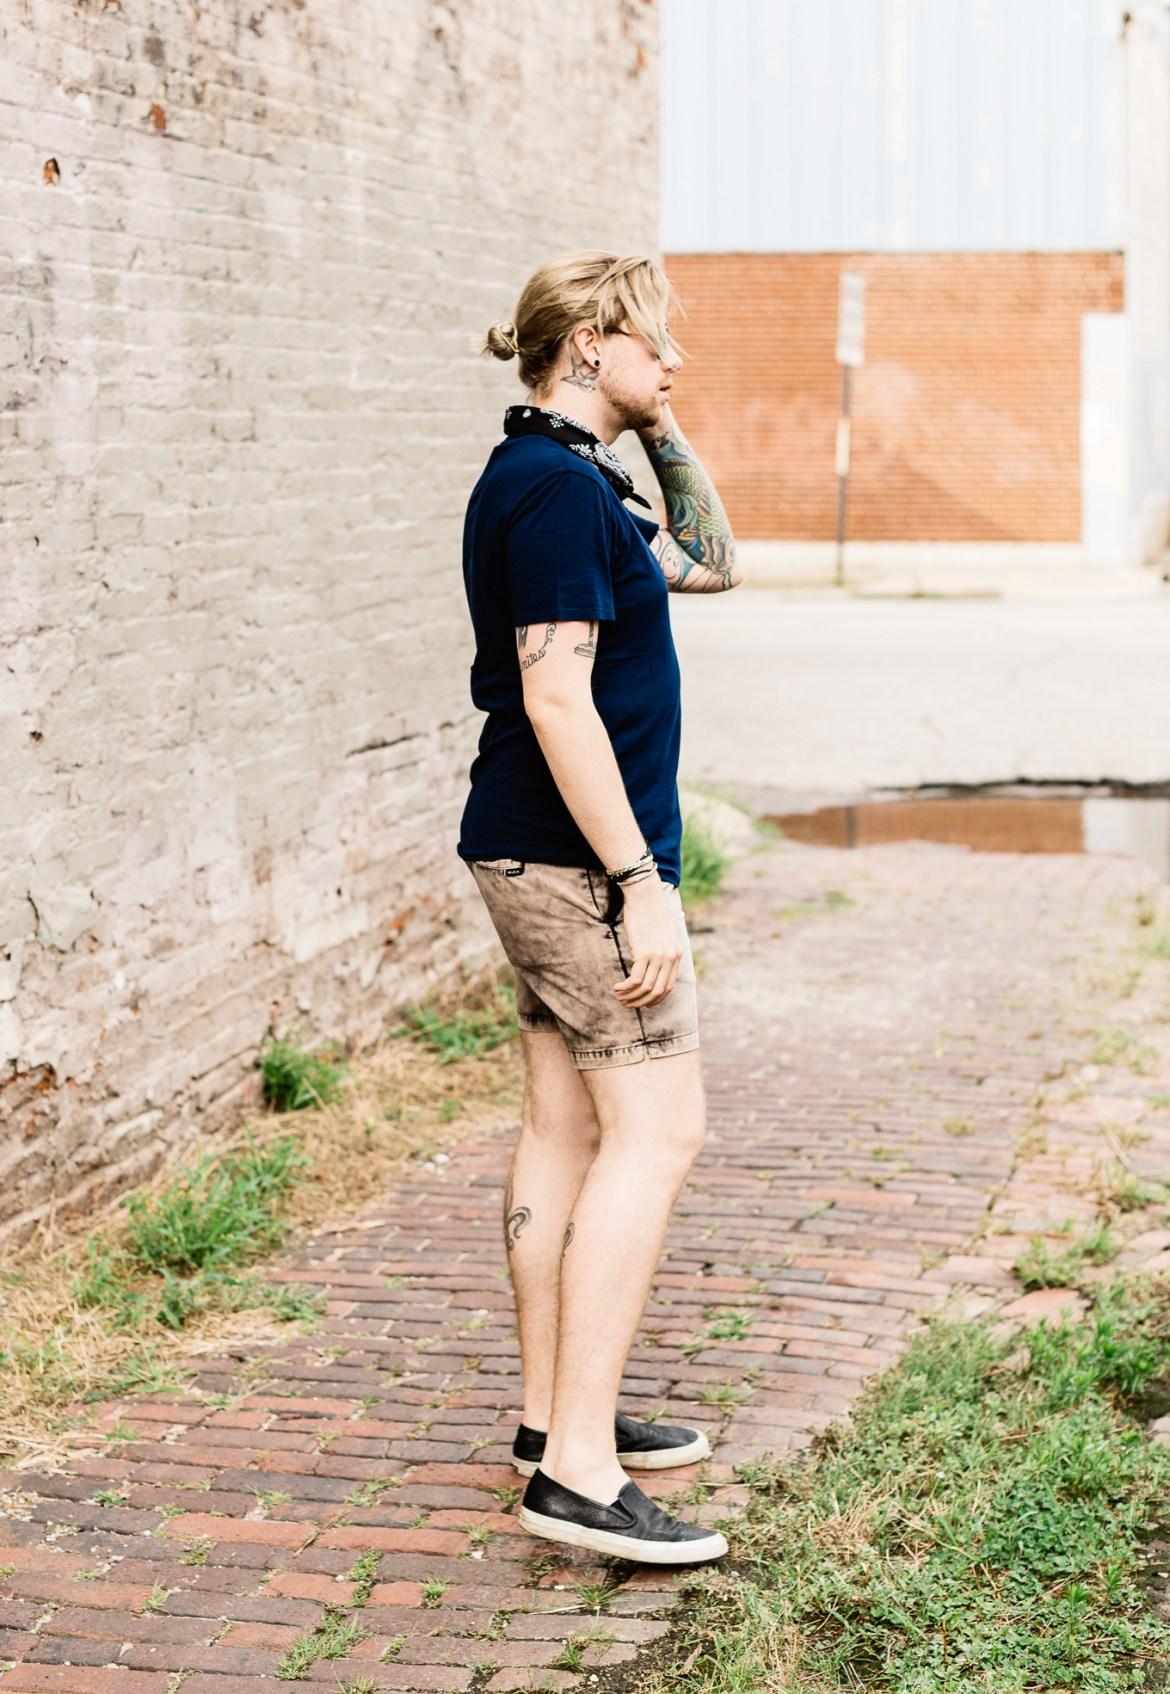 mens personal style blog, kentucky bloggers, urban outfitters bandana, slate and stone shirt, rvca shorts